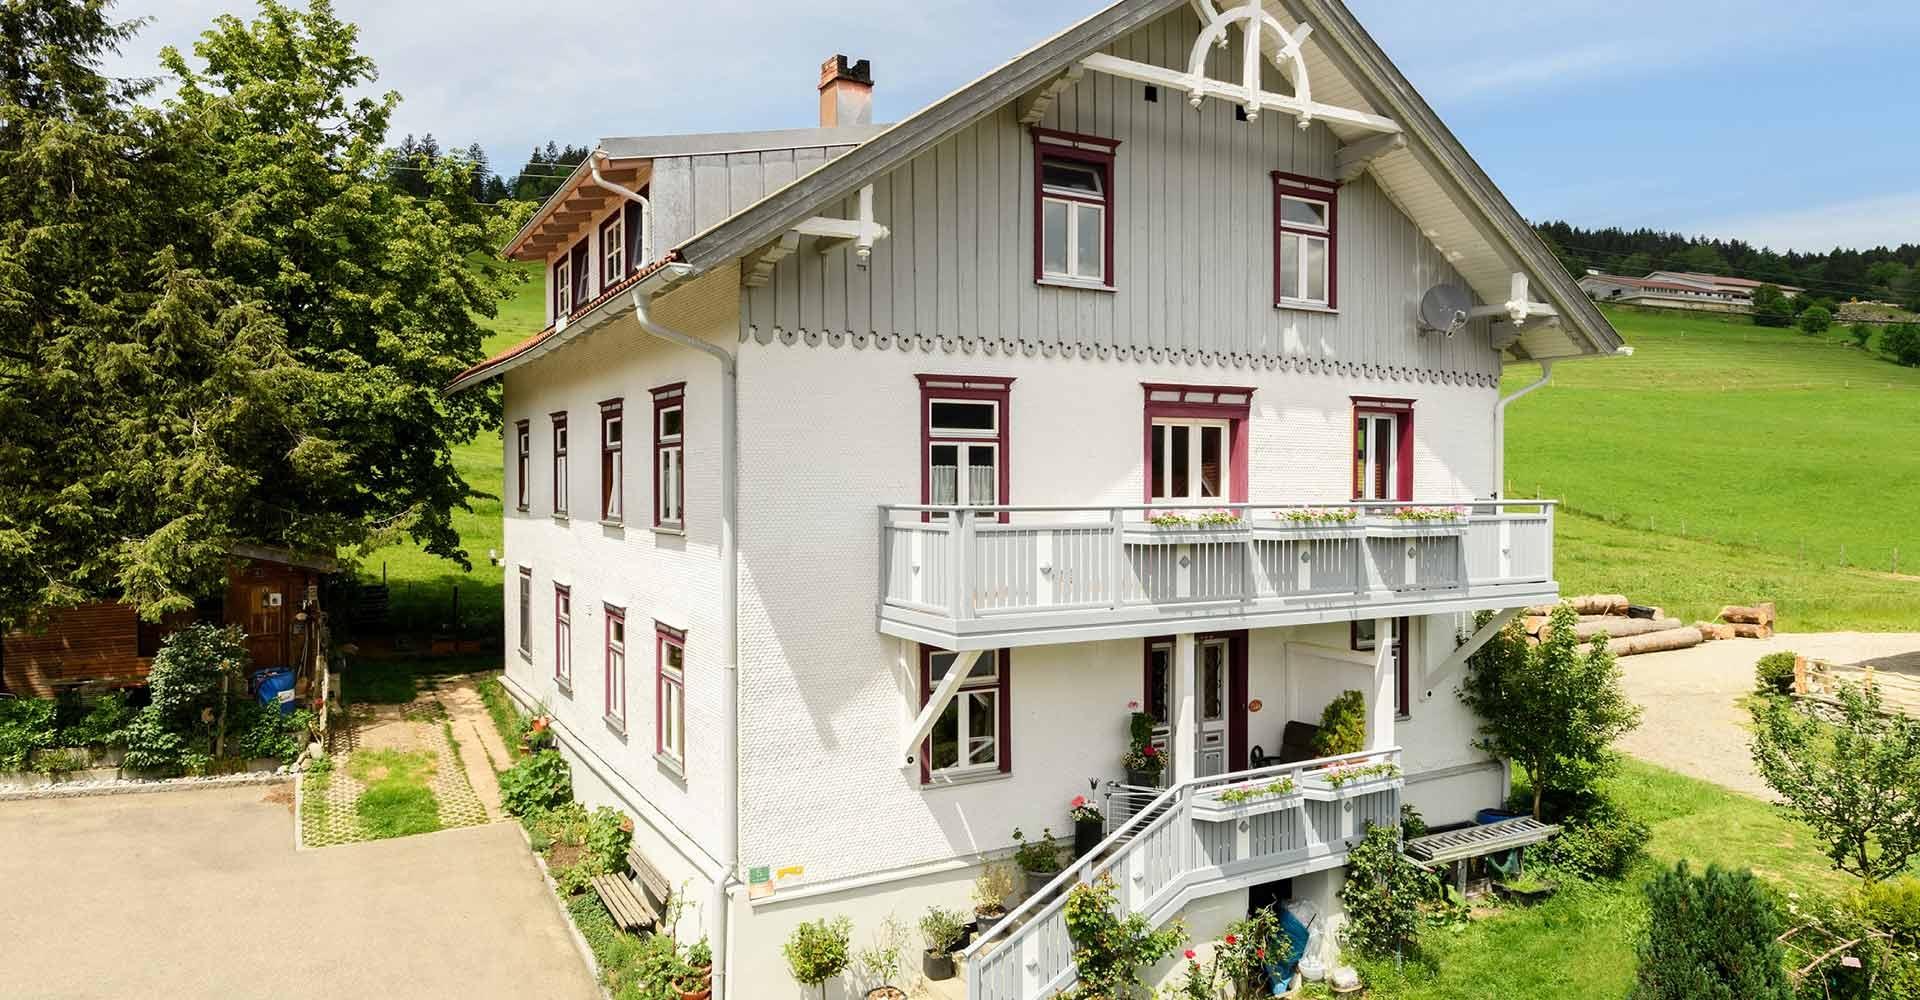 fewo-gebhardshoehe-rettenberg-allgaeuF6EB0723-4681-7CE9-DB55-623BF437590D.jpg